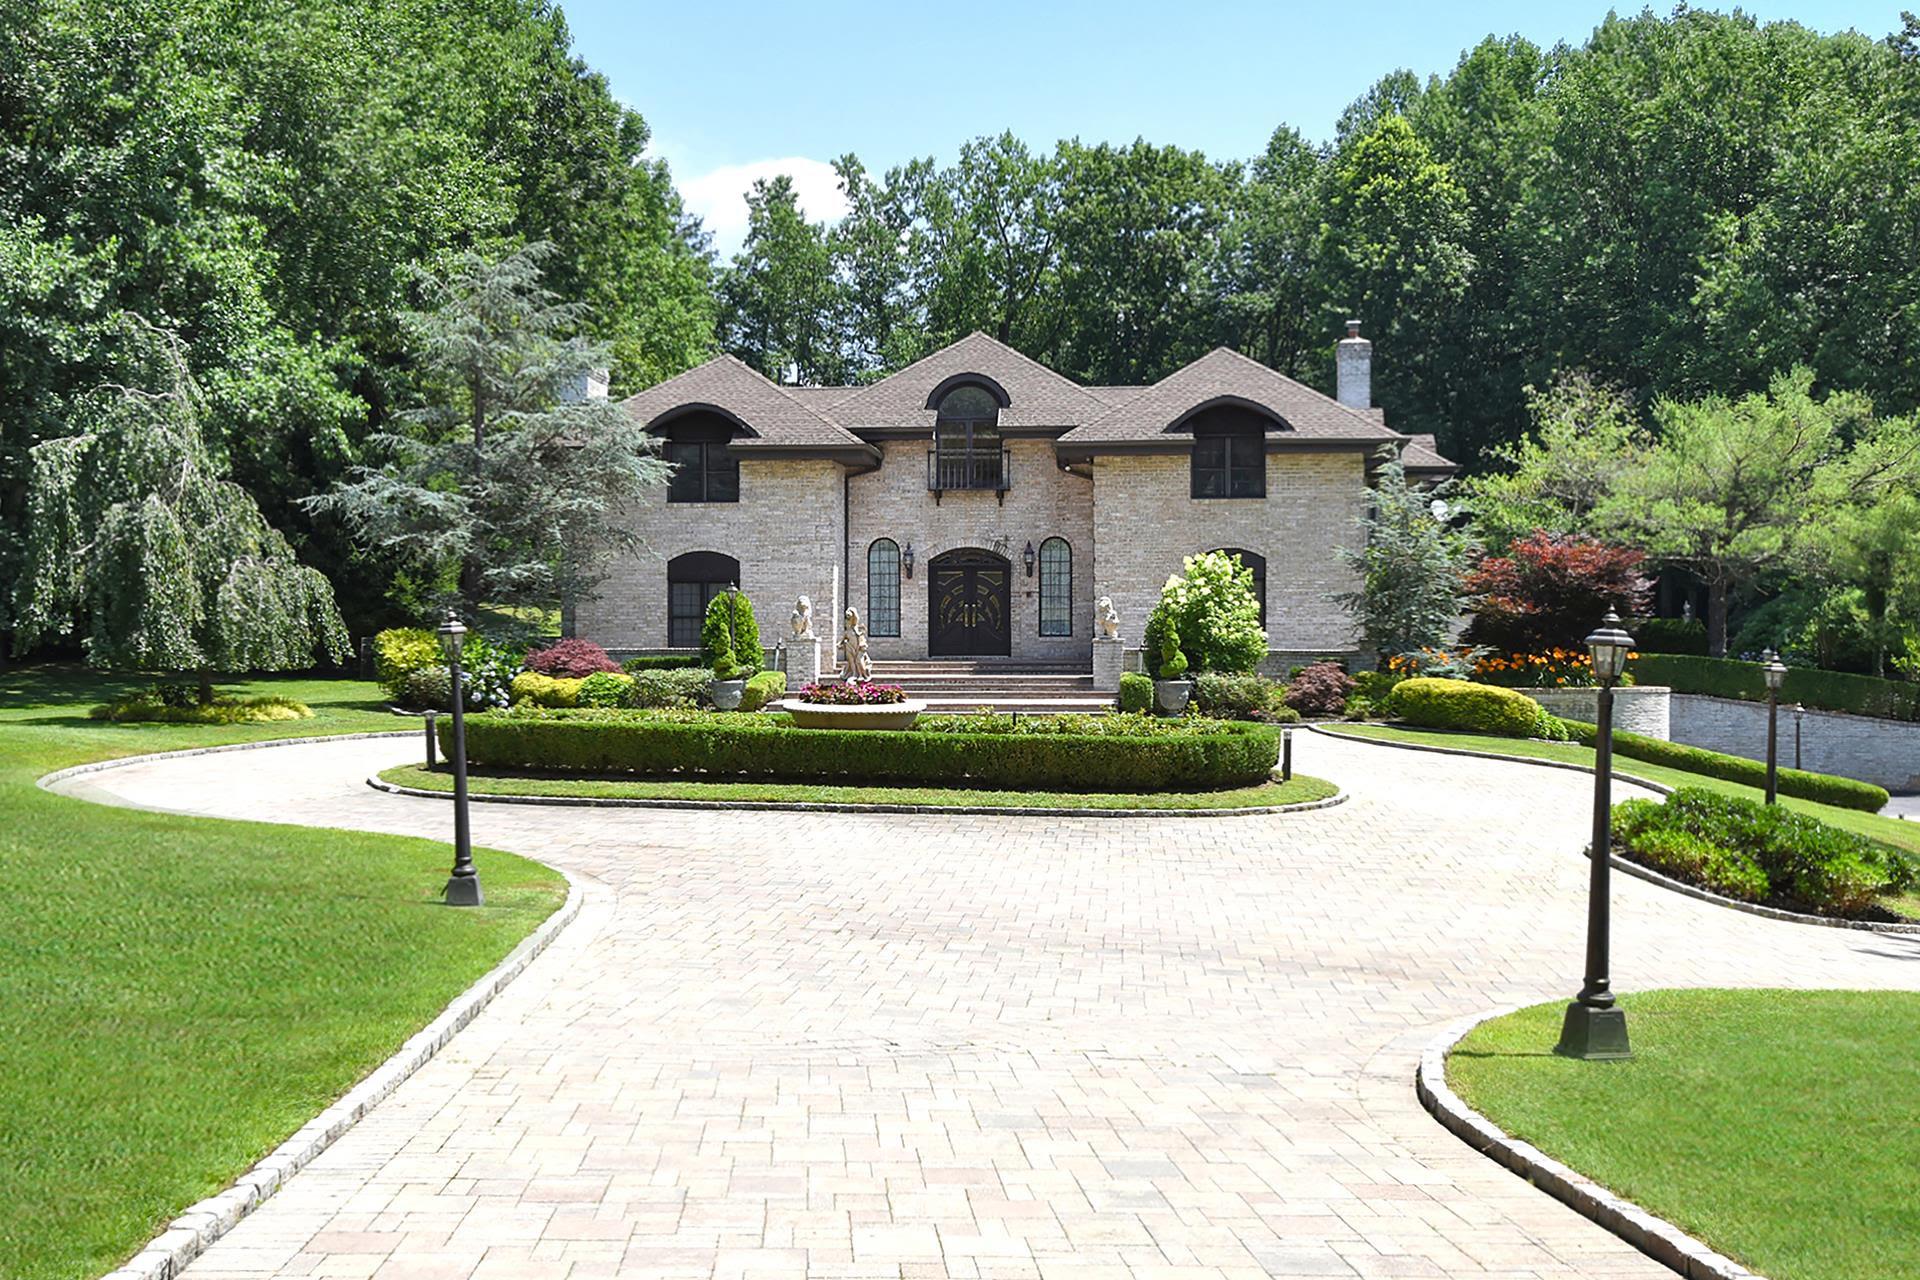 Old Westbury Real Estate & Homes for Sale   Douglas Elliman